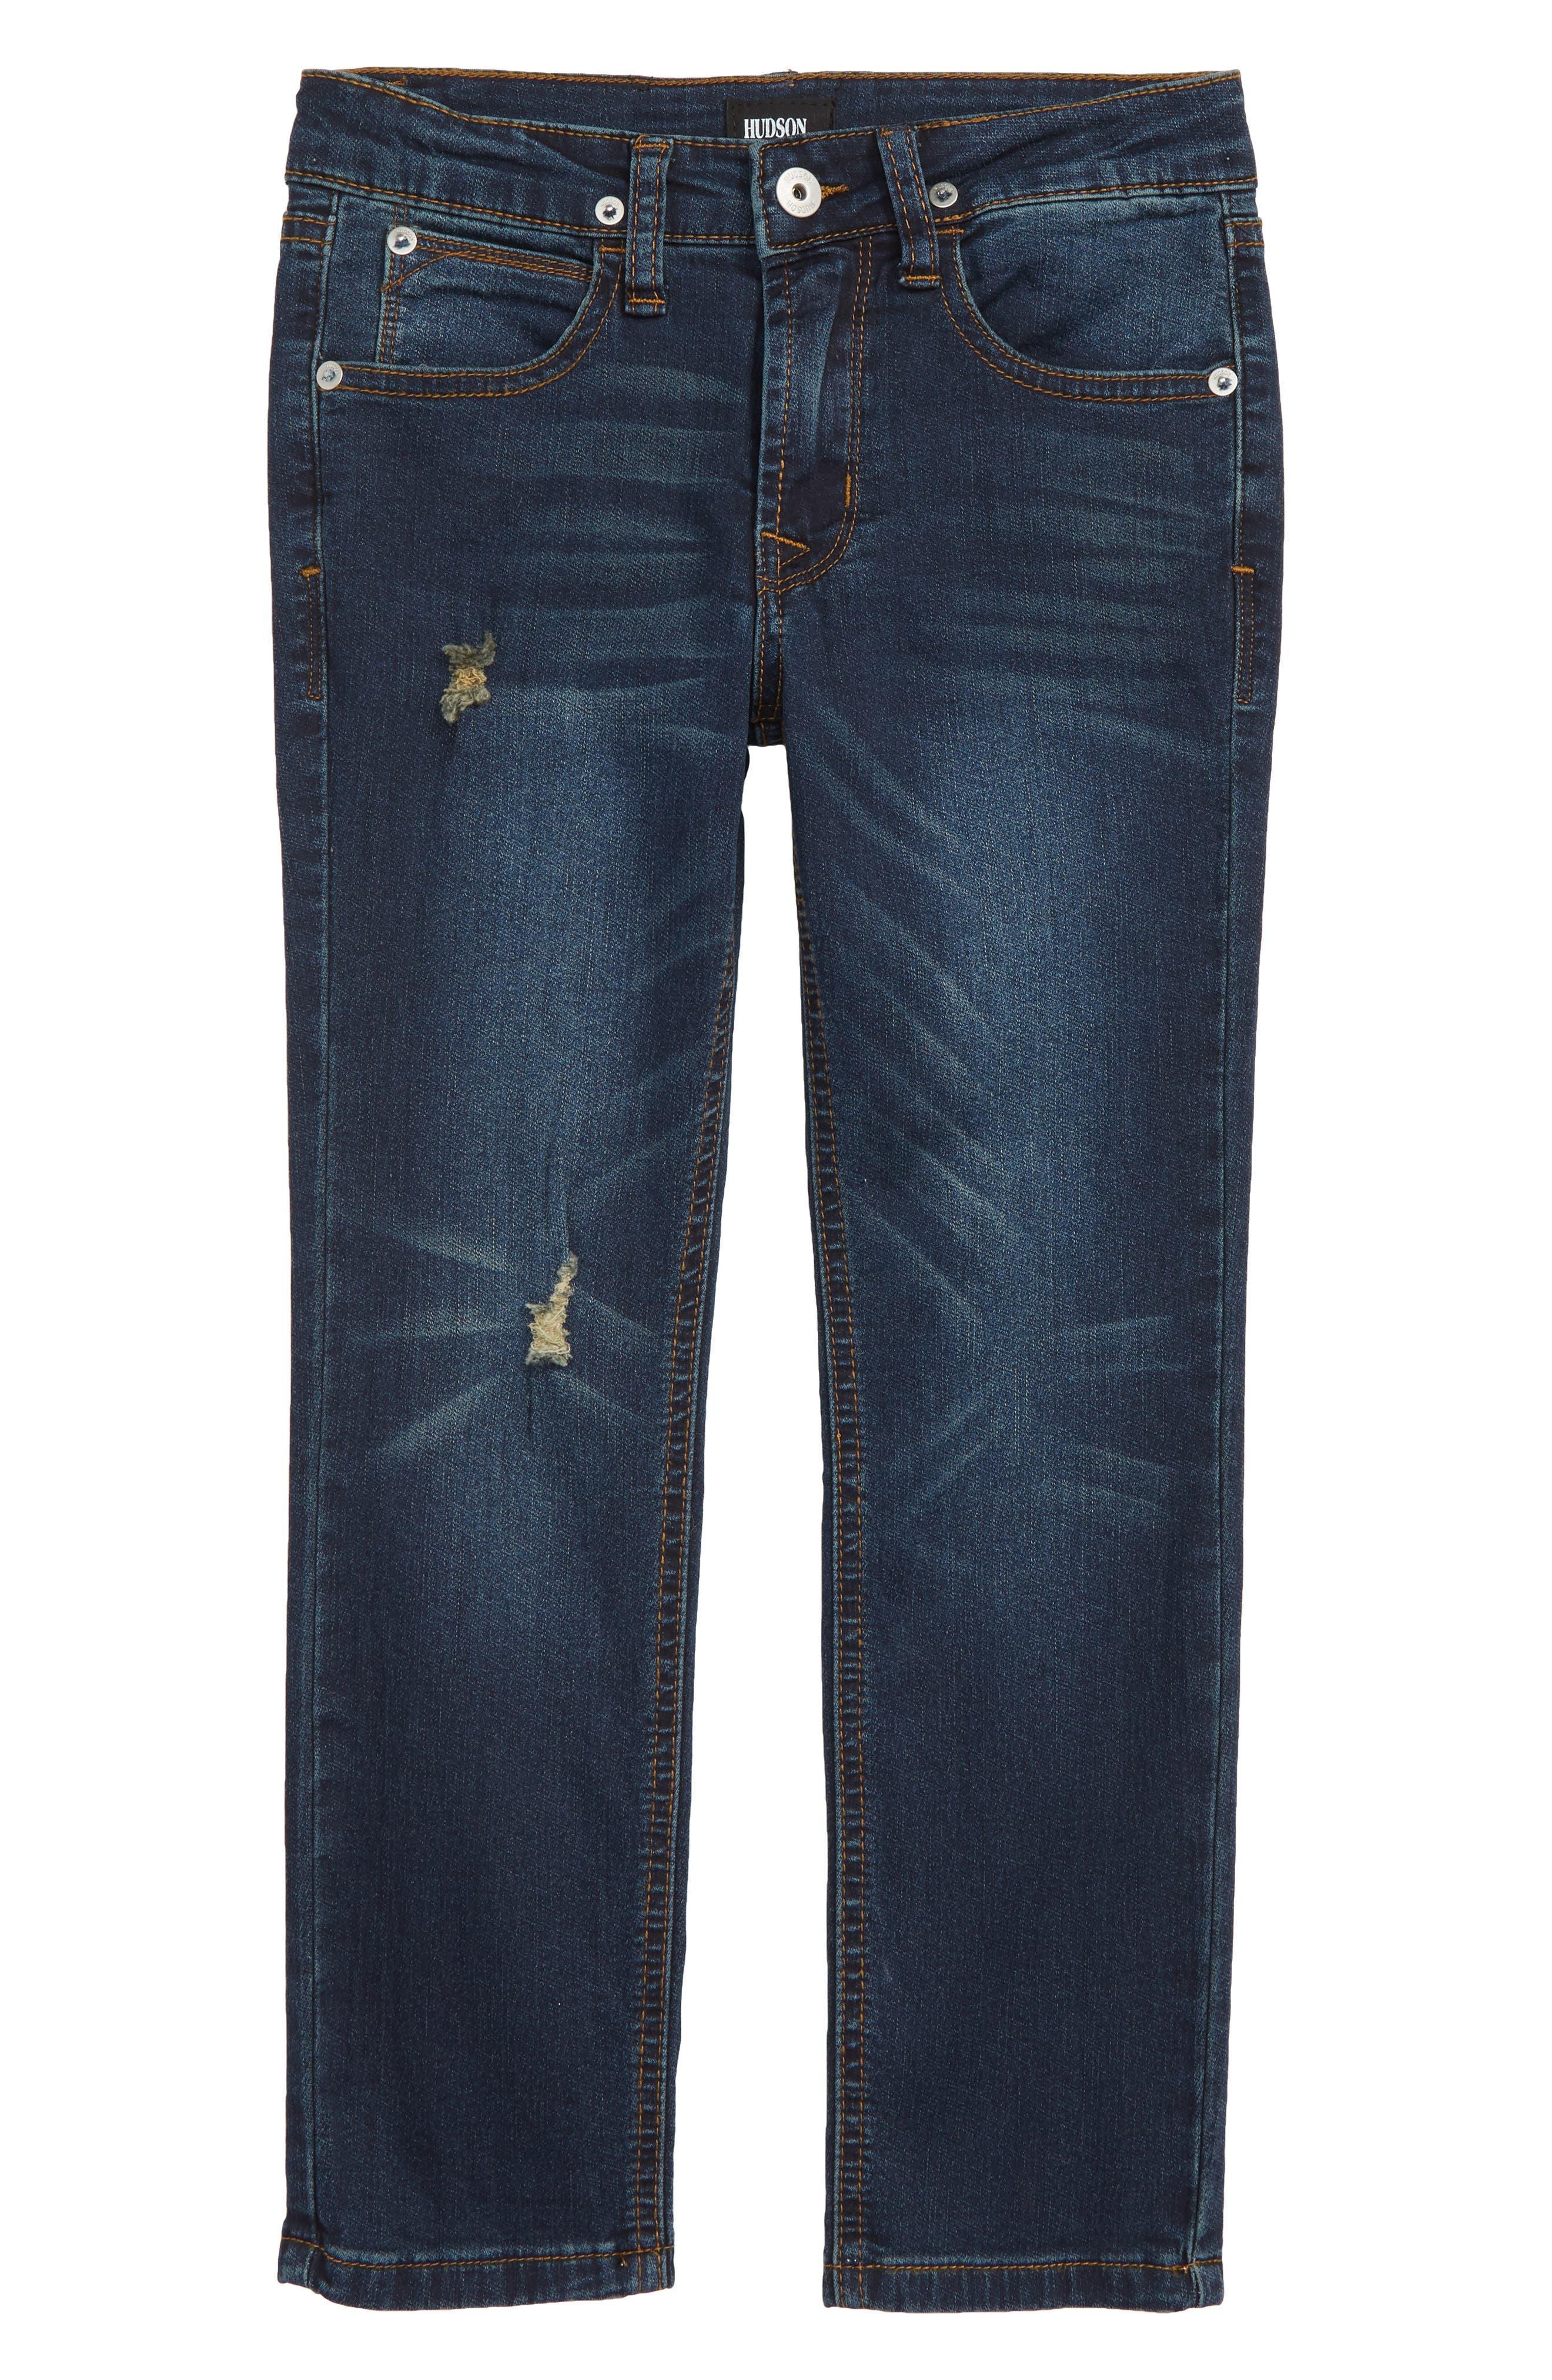 Jagger Slim Fit Straight Leg Jeans,                             Main thumbnail 1, color,                             RIPPED RIPEDO